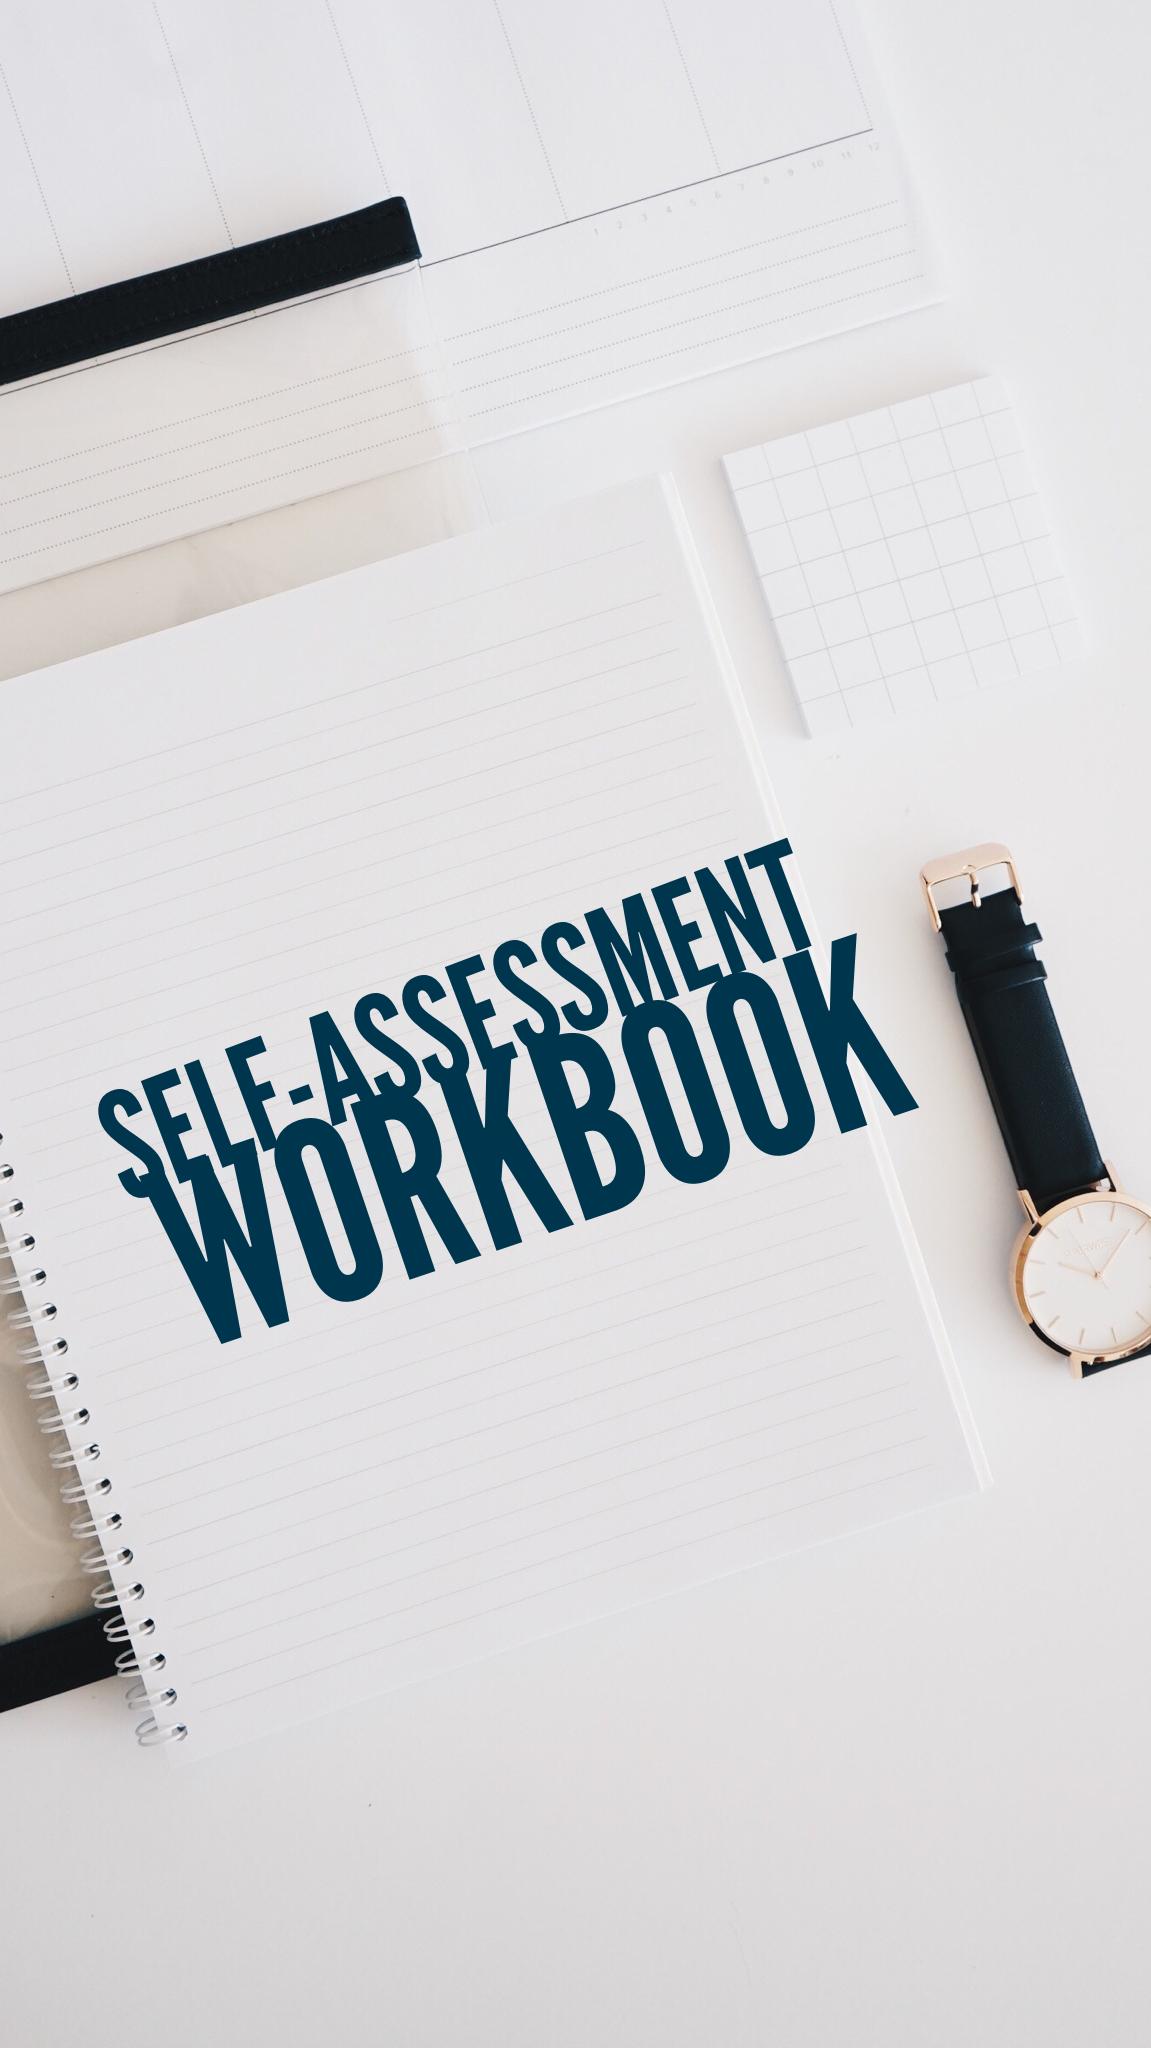 Self Assessment Workbook